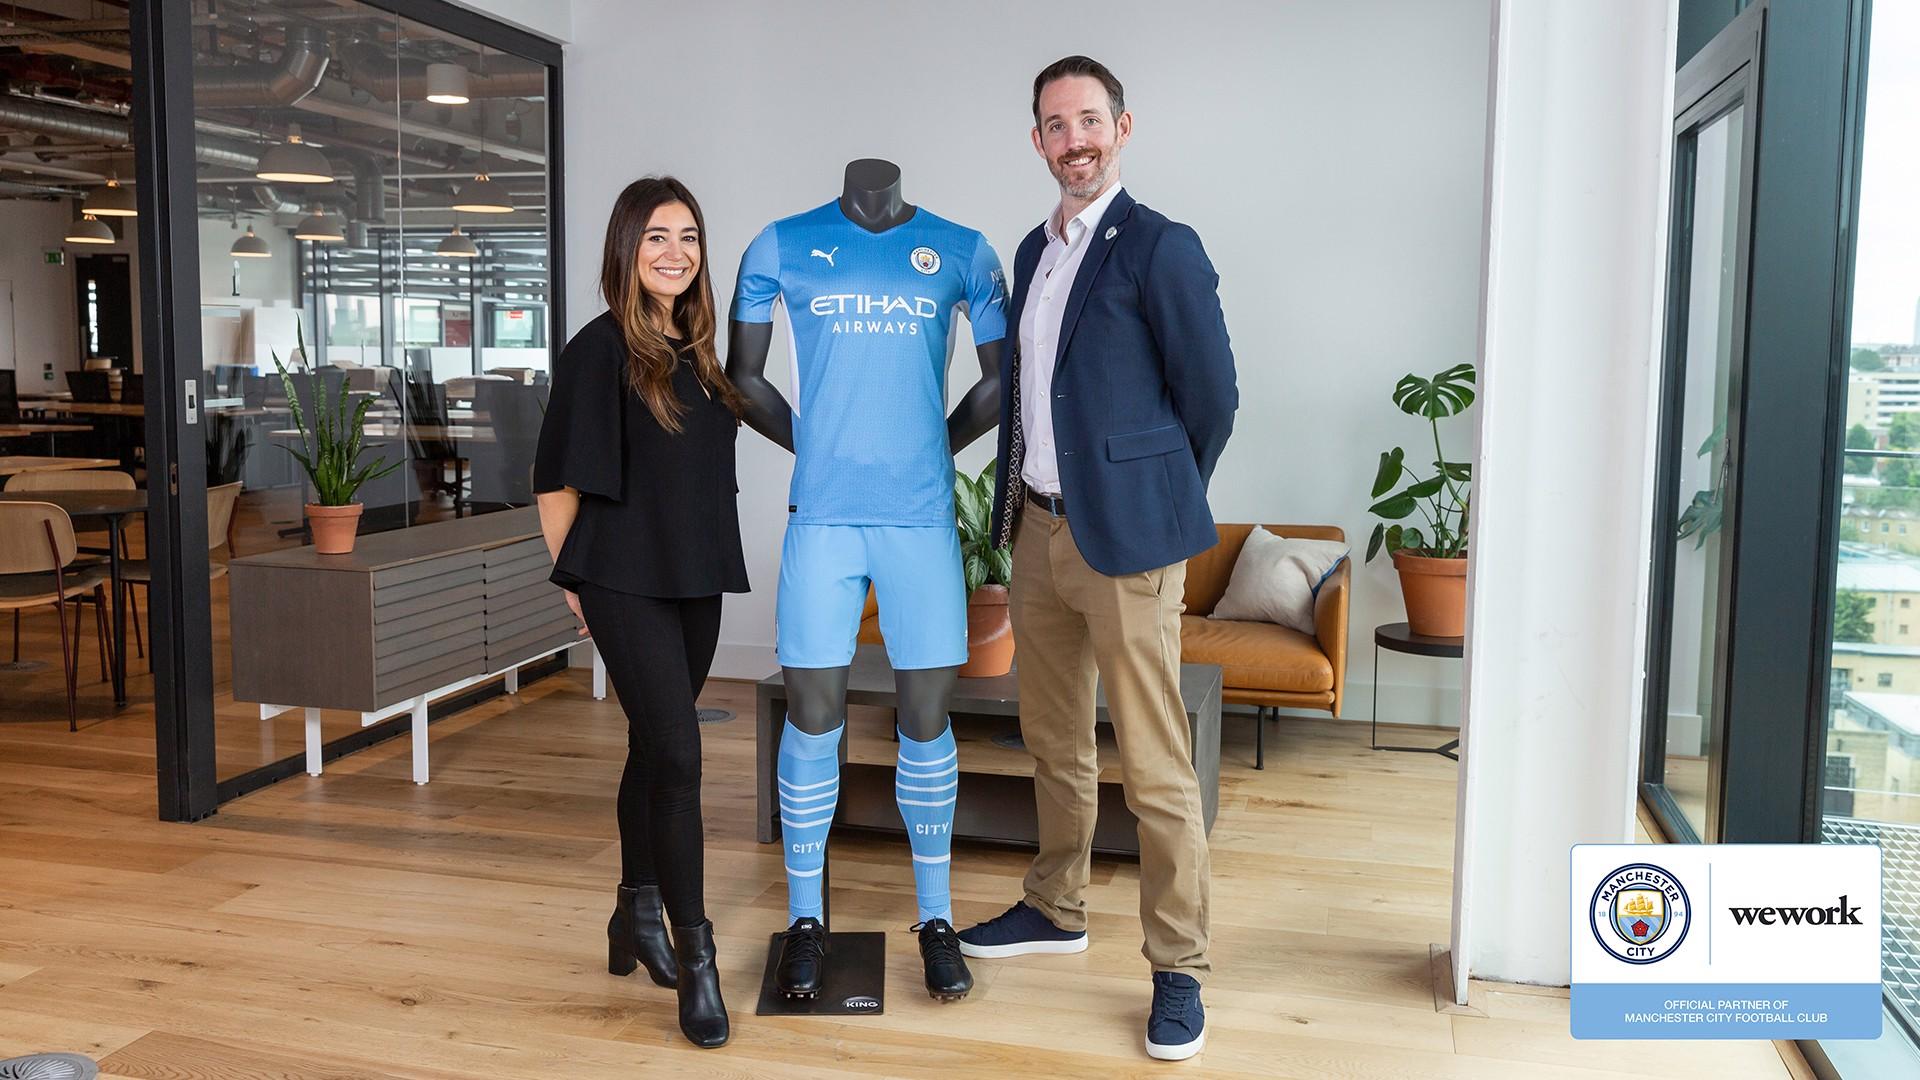 Tom Boyle, VP, Global Partnerships Marketing & Operations, City Football Group celebrates the new partnership with Amanda Zafiris, VP, Head of Marketing, International, WeWork.